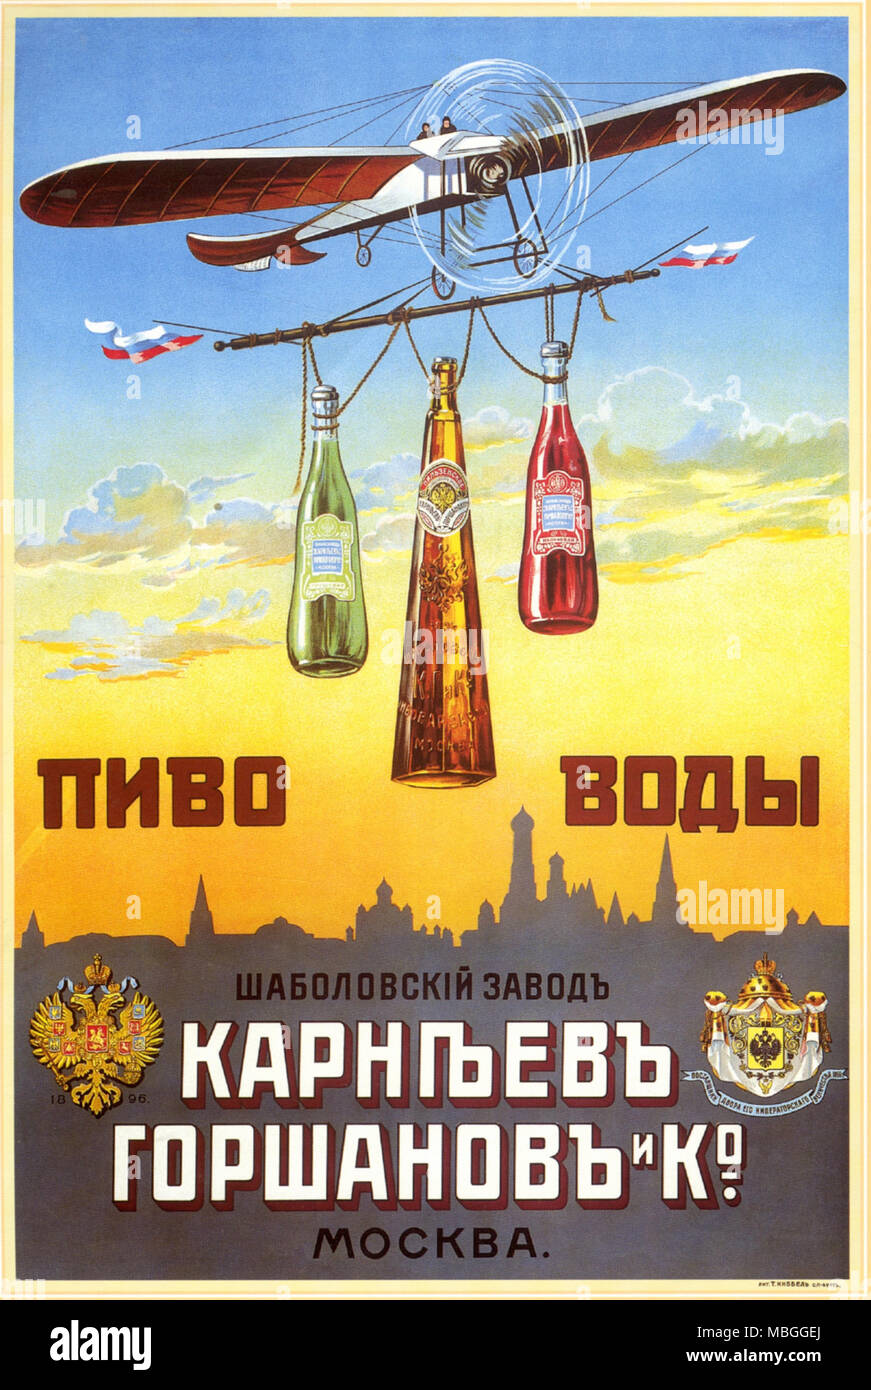 Beer & Waters - Bottled Drinks from Karneyev-Gorshanov & Co. - Stock Image